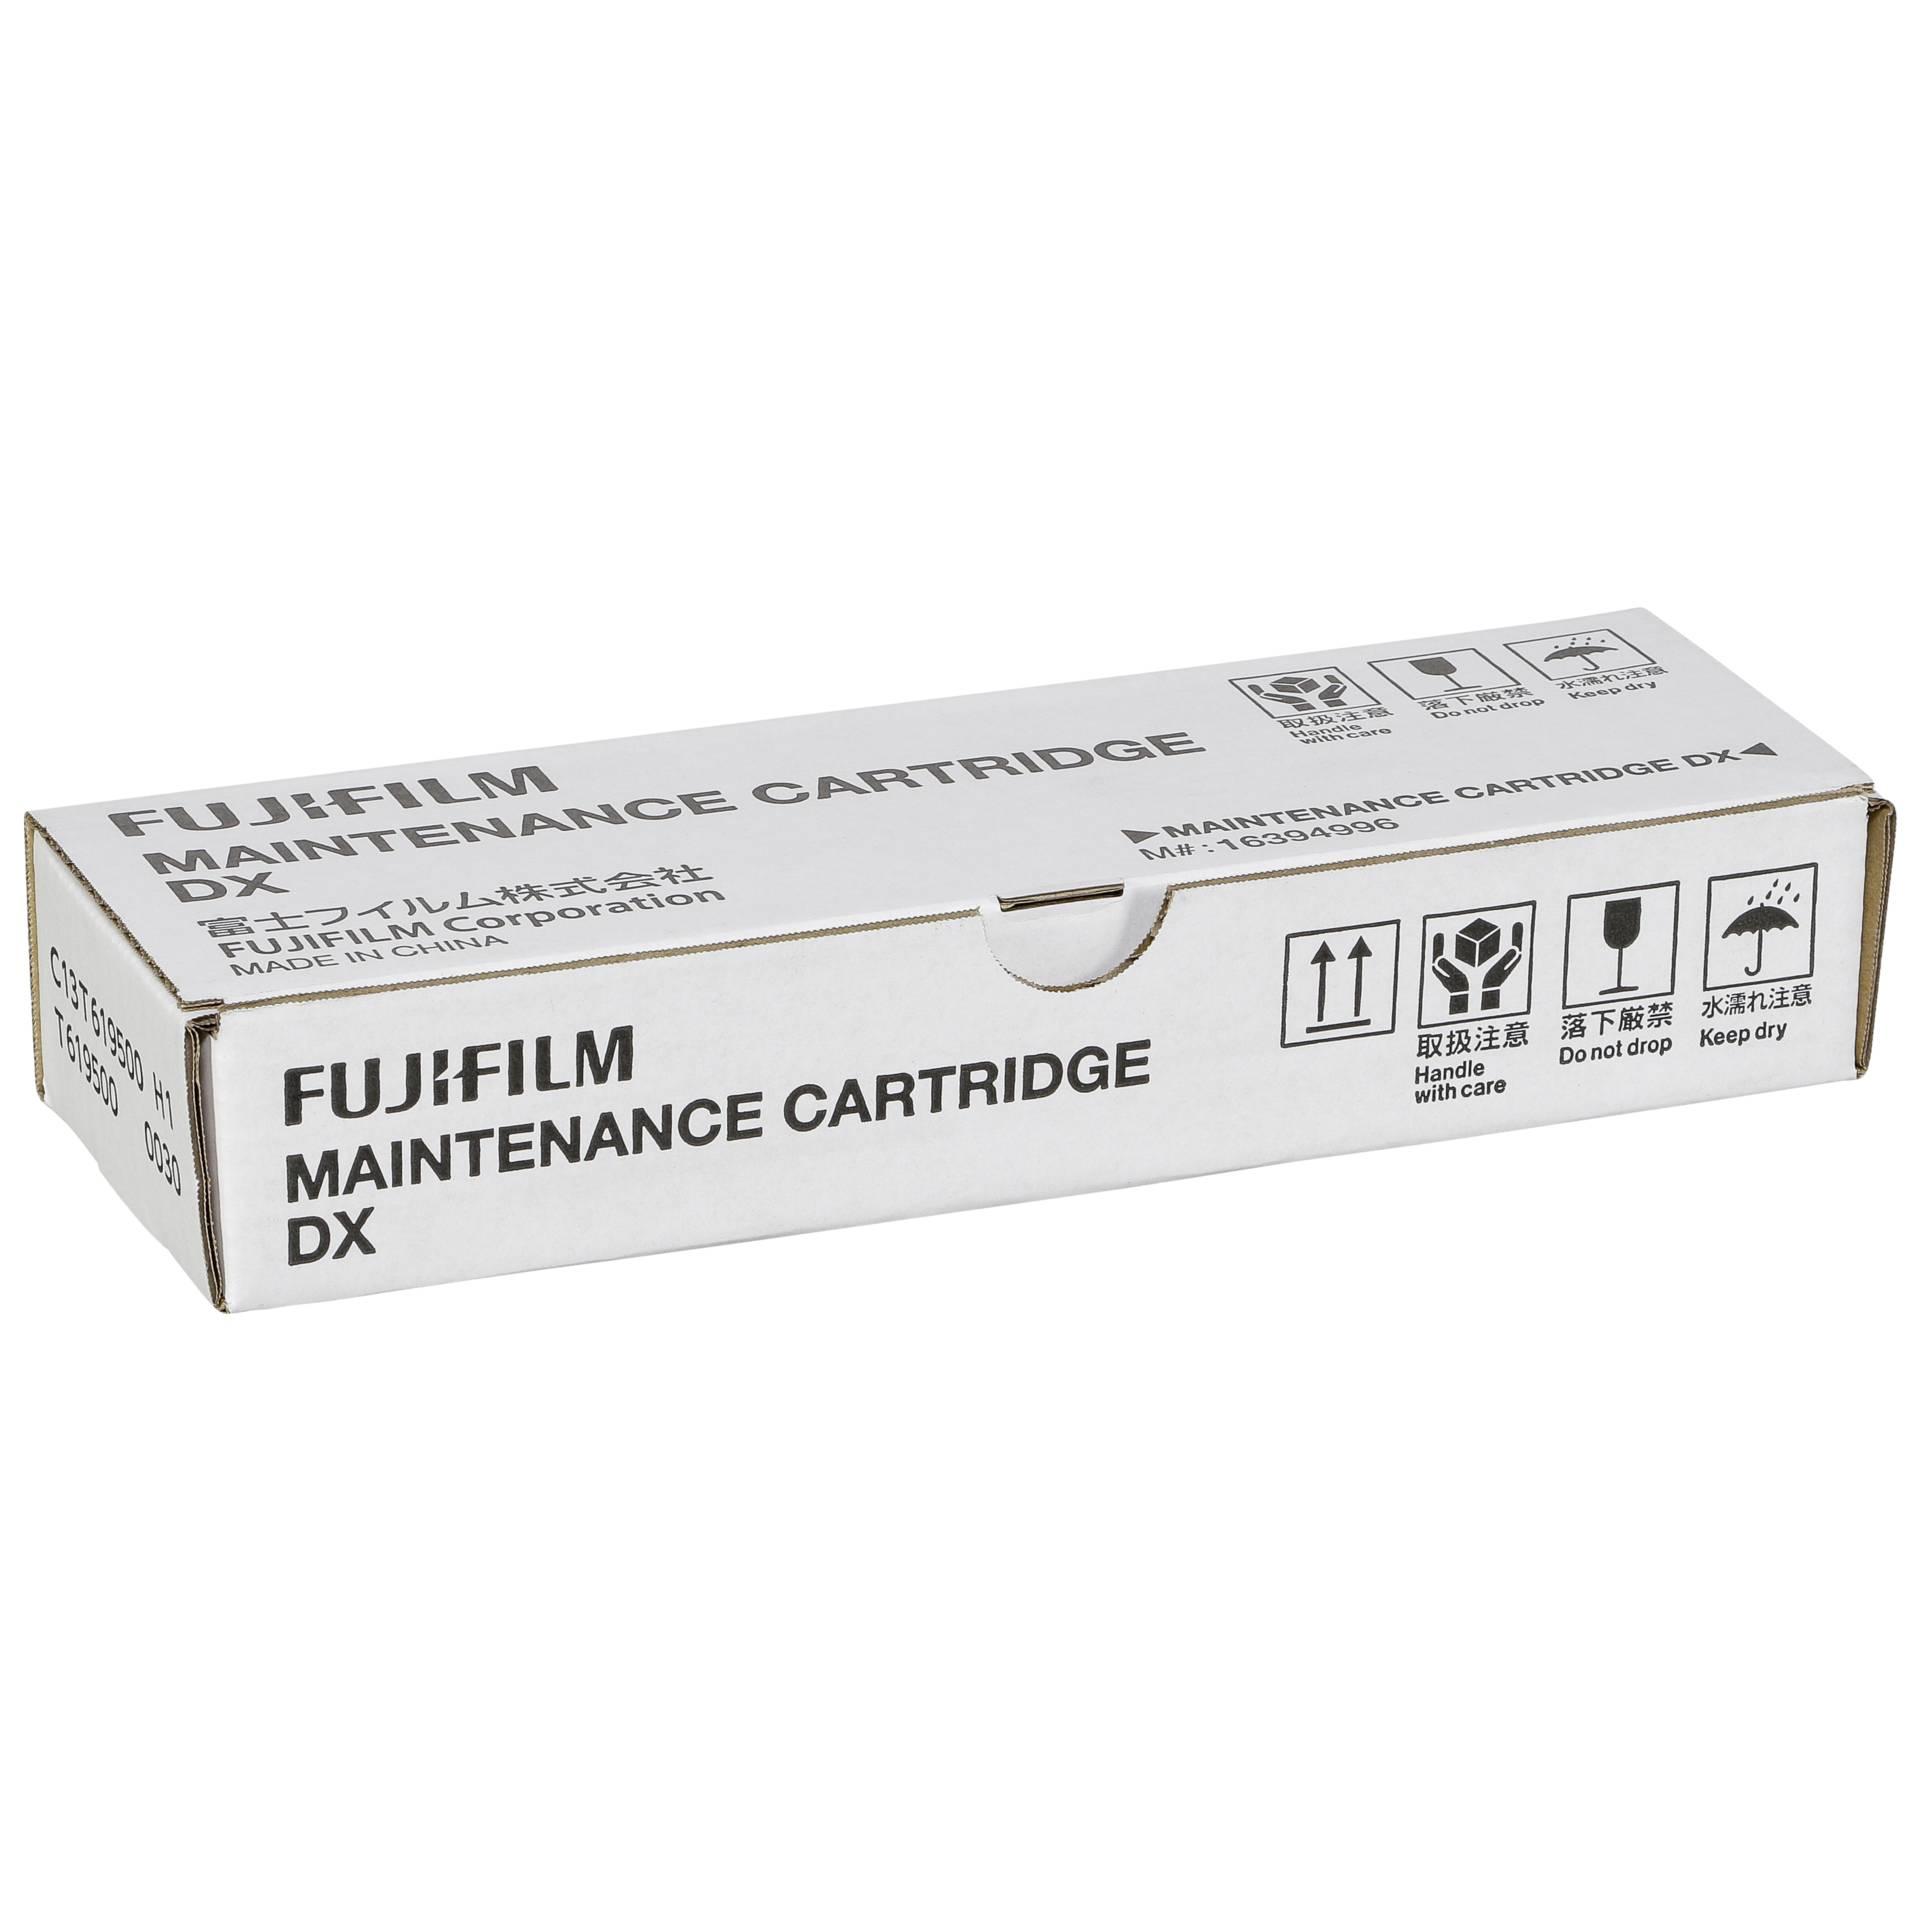 Fujifilm Maintenance Tank DX